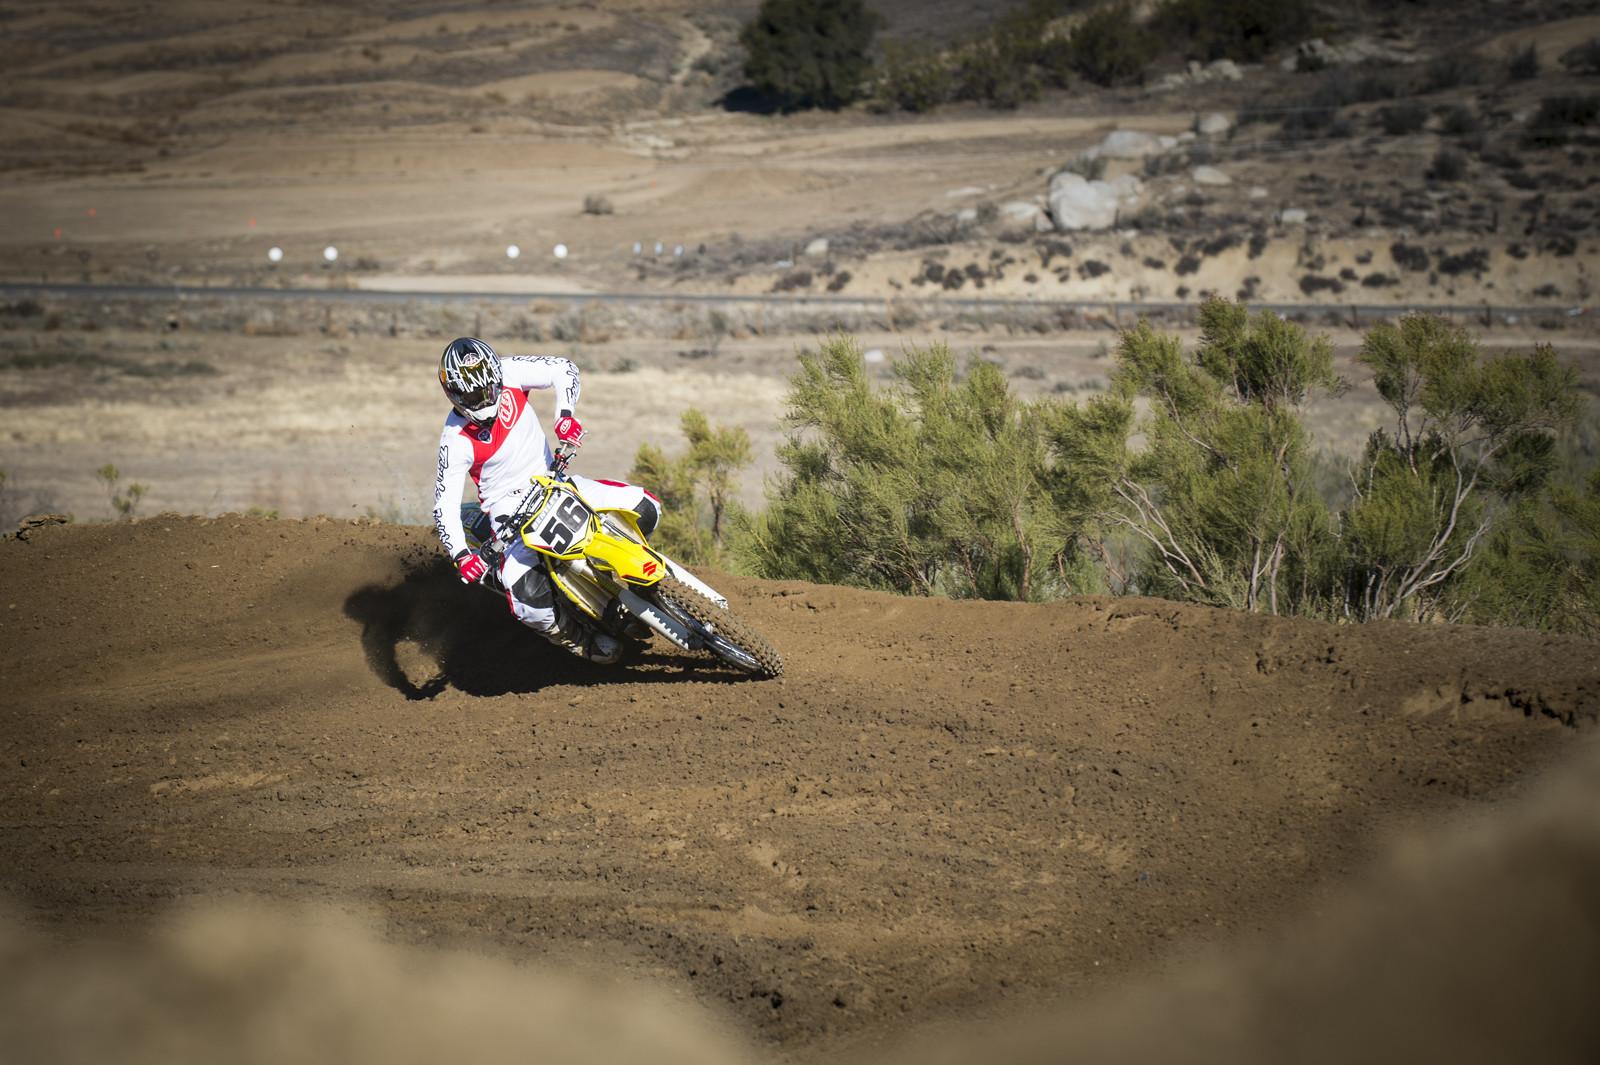 Curtis Keene - Ian Collins - Mountain Biking Pictures - Vital MTB